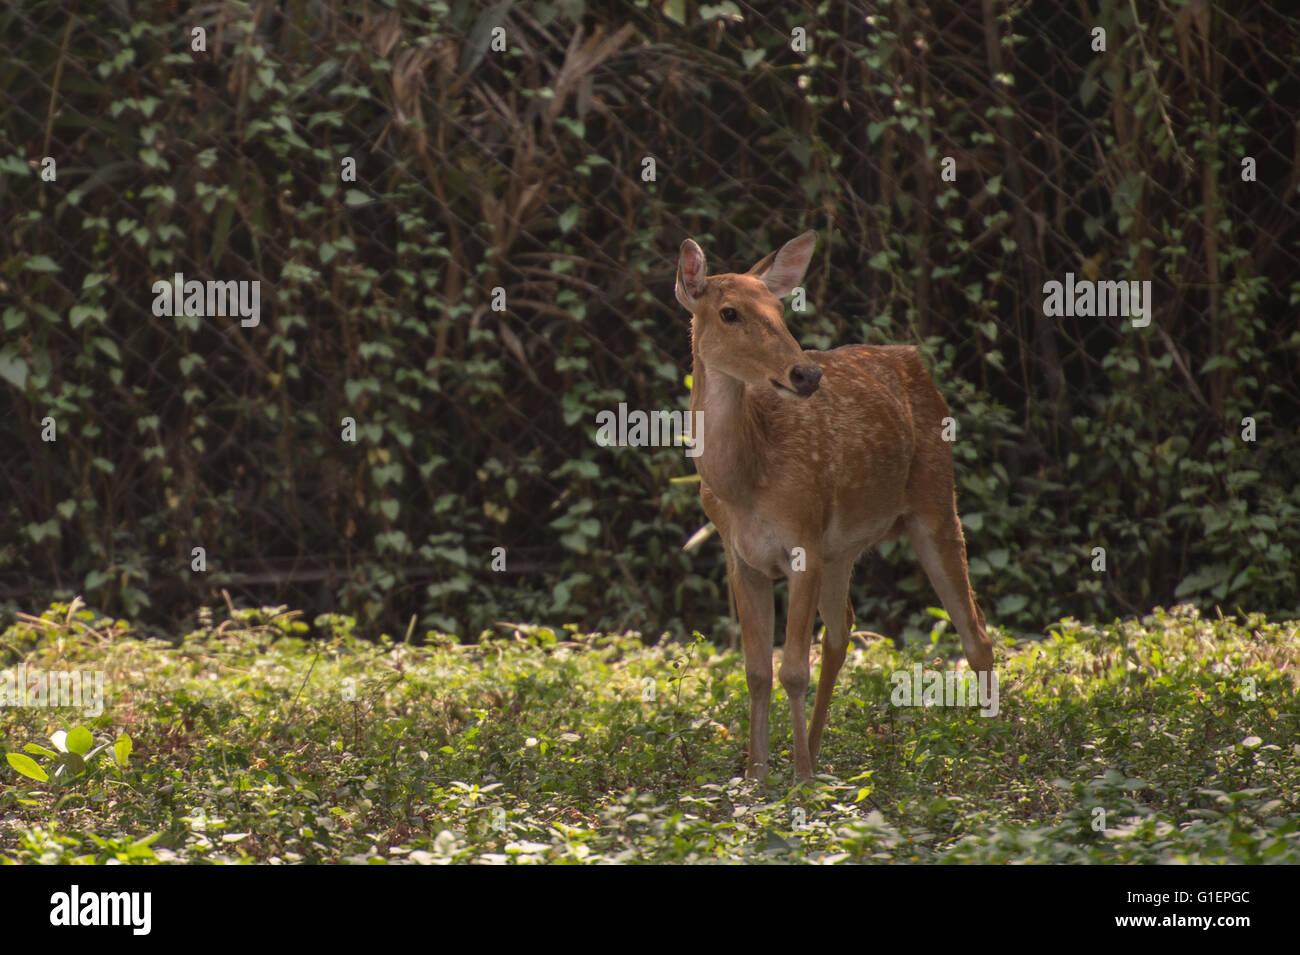 Swamp deer, barasingha, Rucervus duvaucelii, Cervidae, India, Asia - Stock Image